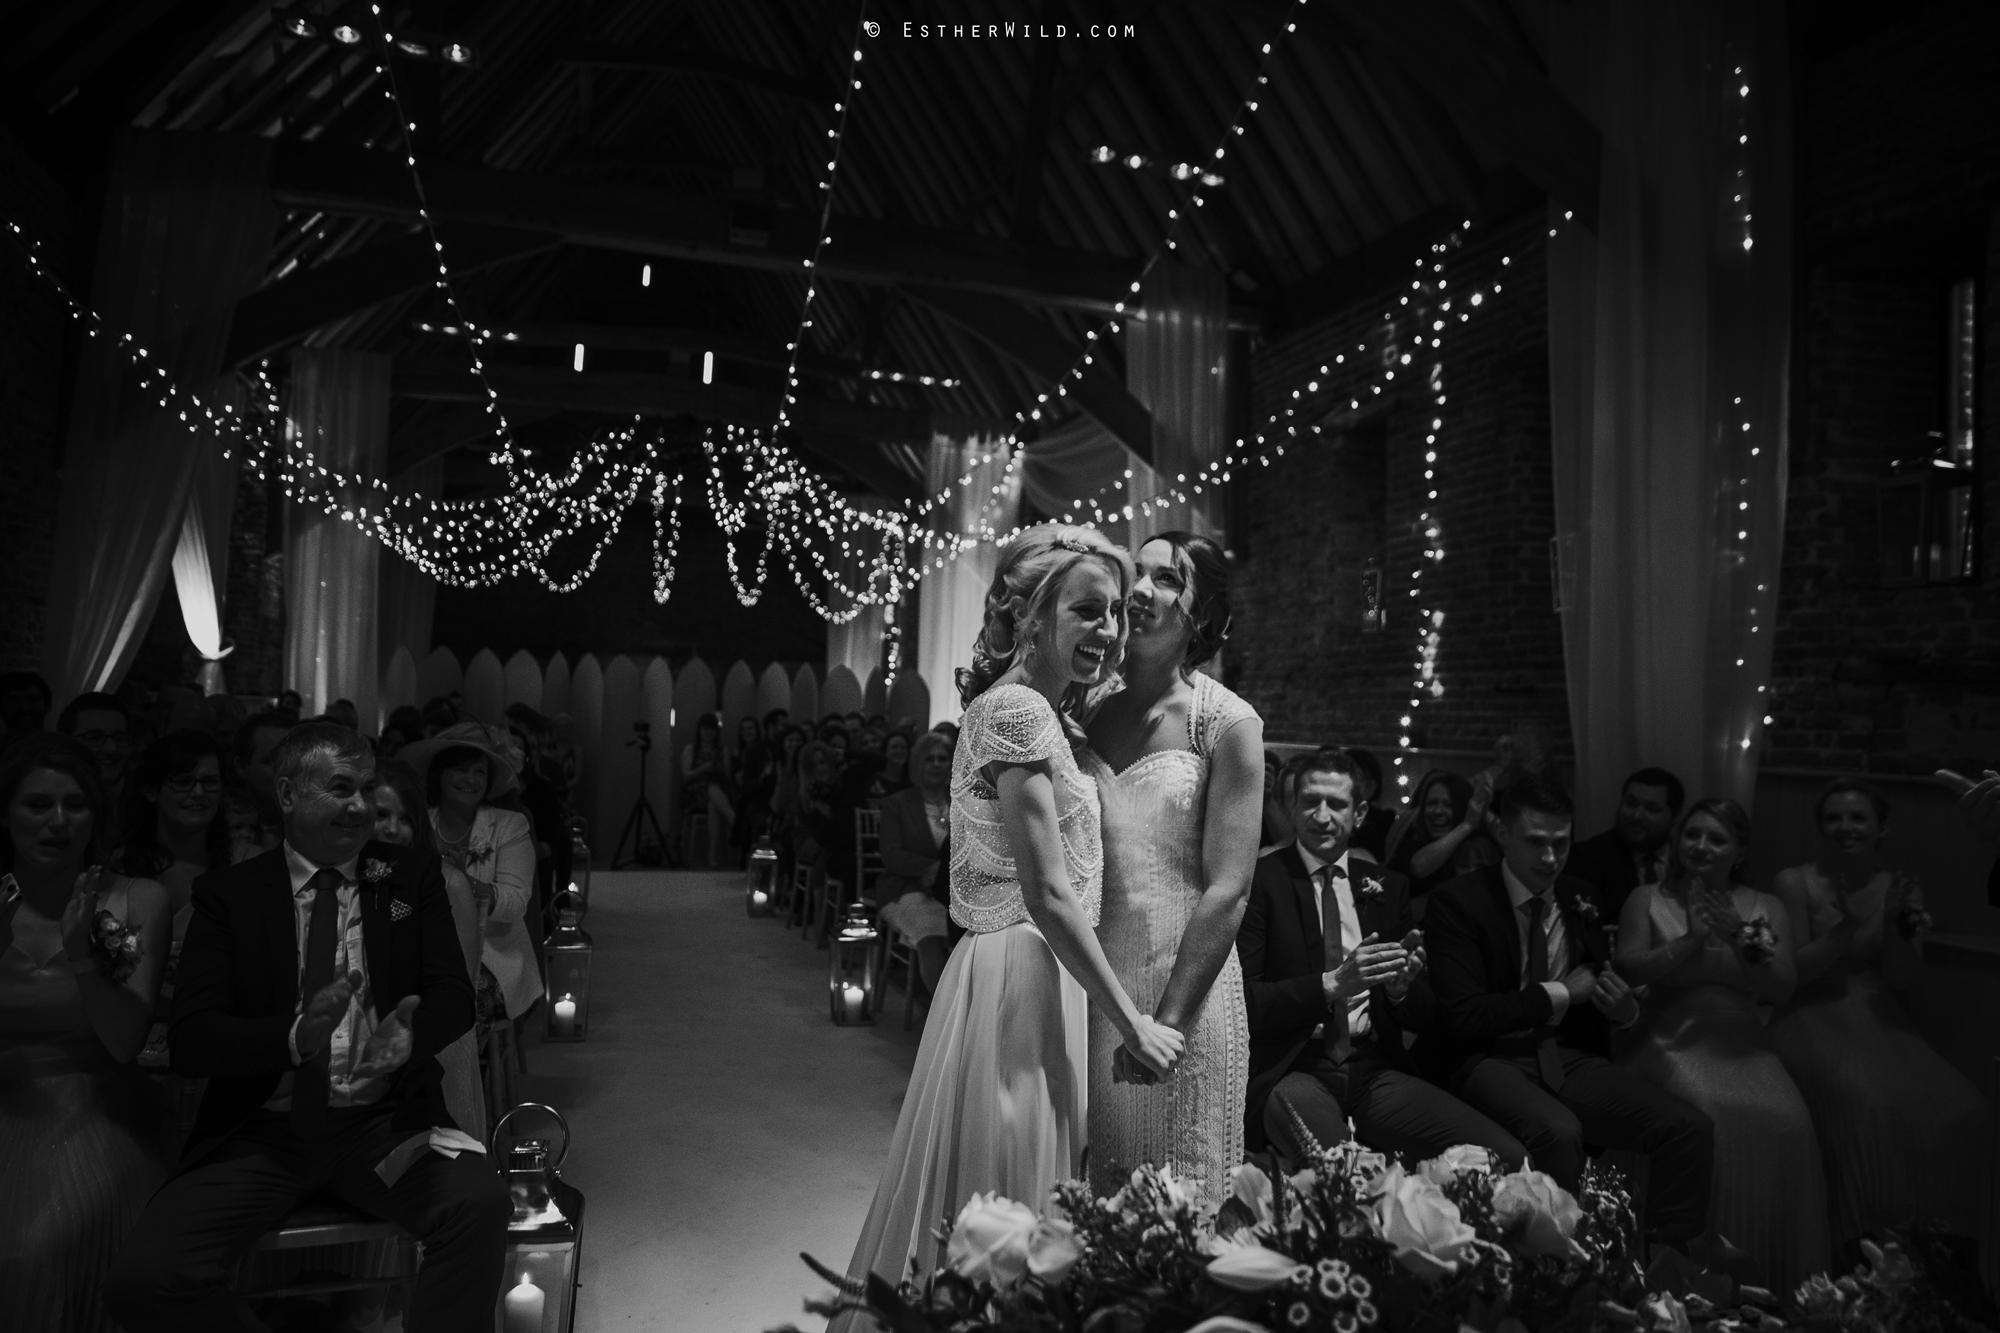 Elms_Barn_Weddings_Suffolk_Photographer_Copyright_Esther_Wild_IMG_1289-2.jpg